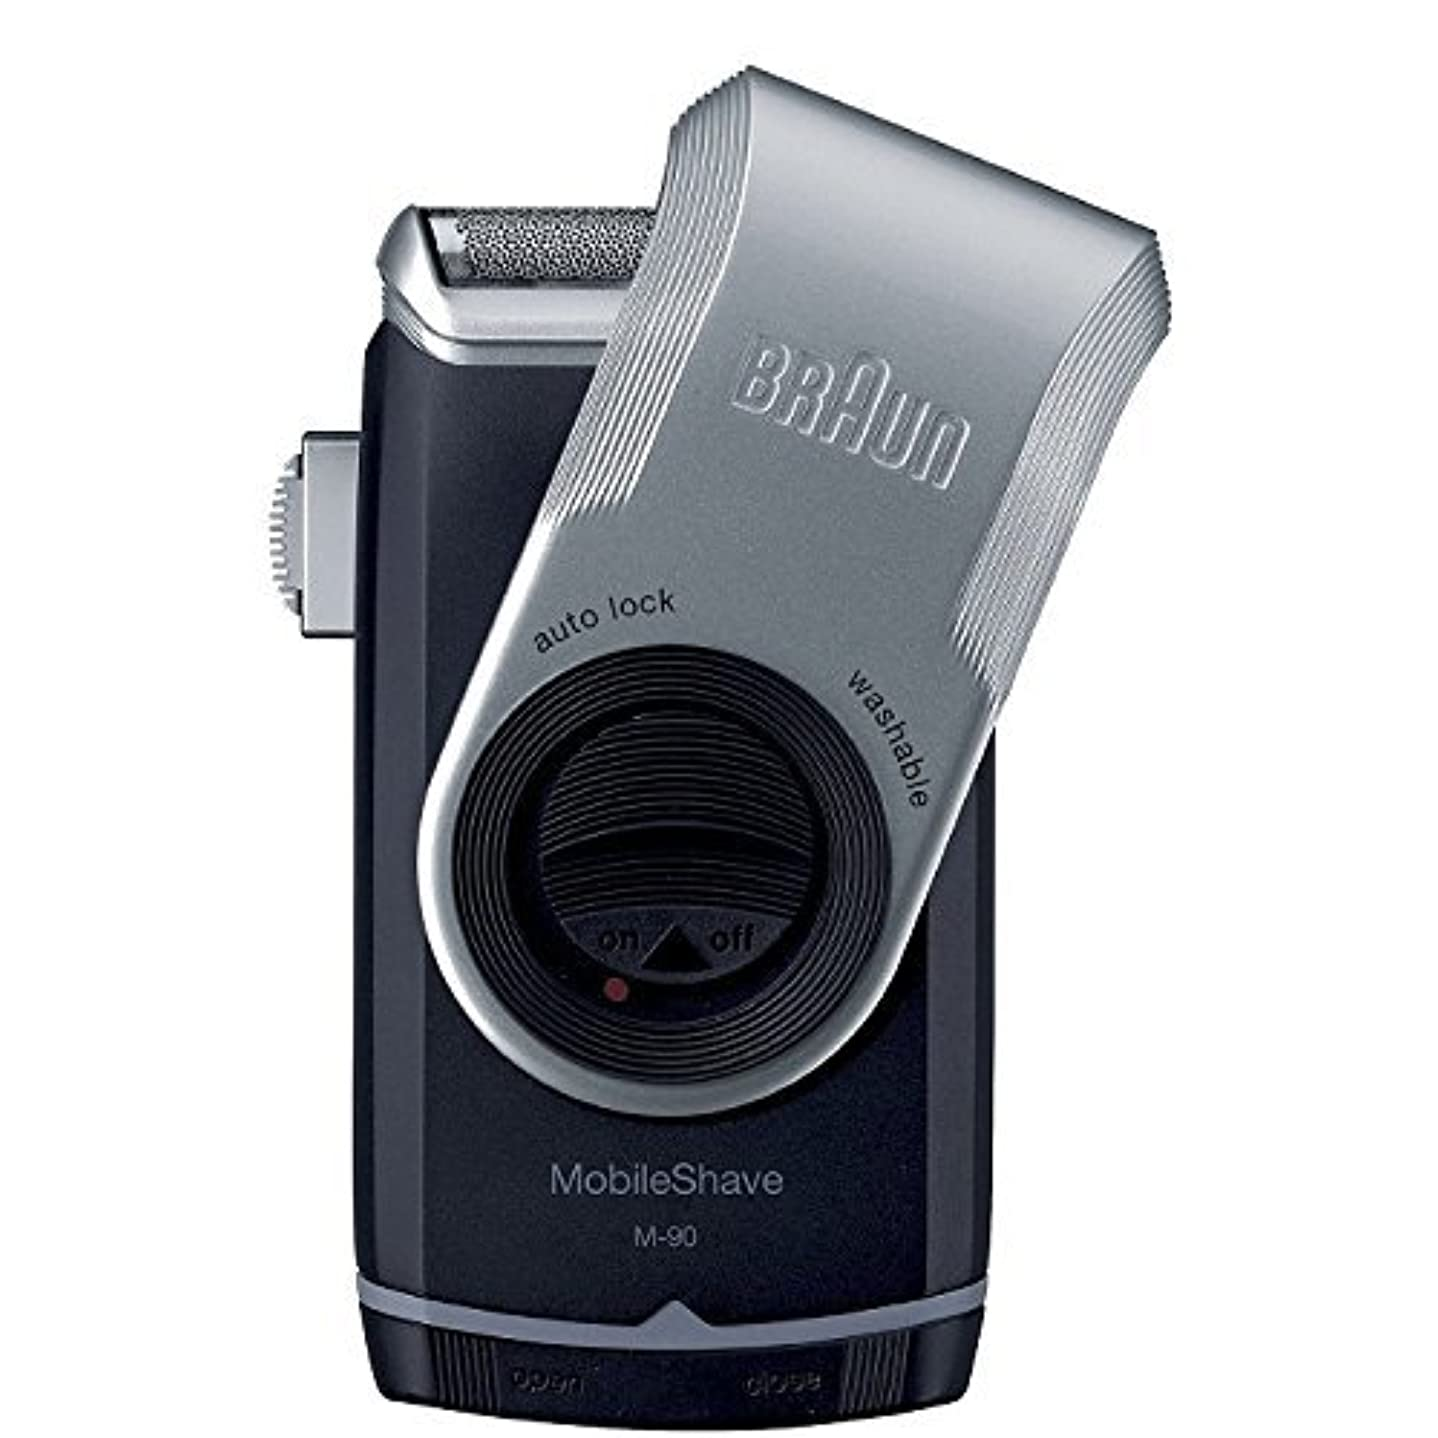 Braun M90 Pocketgo Mobileshave スマートホイルでポータブルシェーバー [並行輸入品]